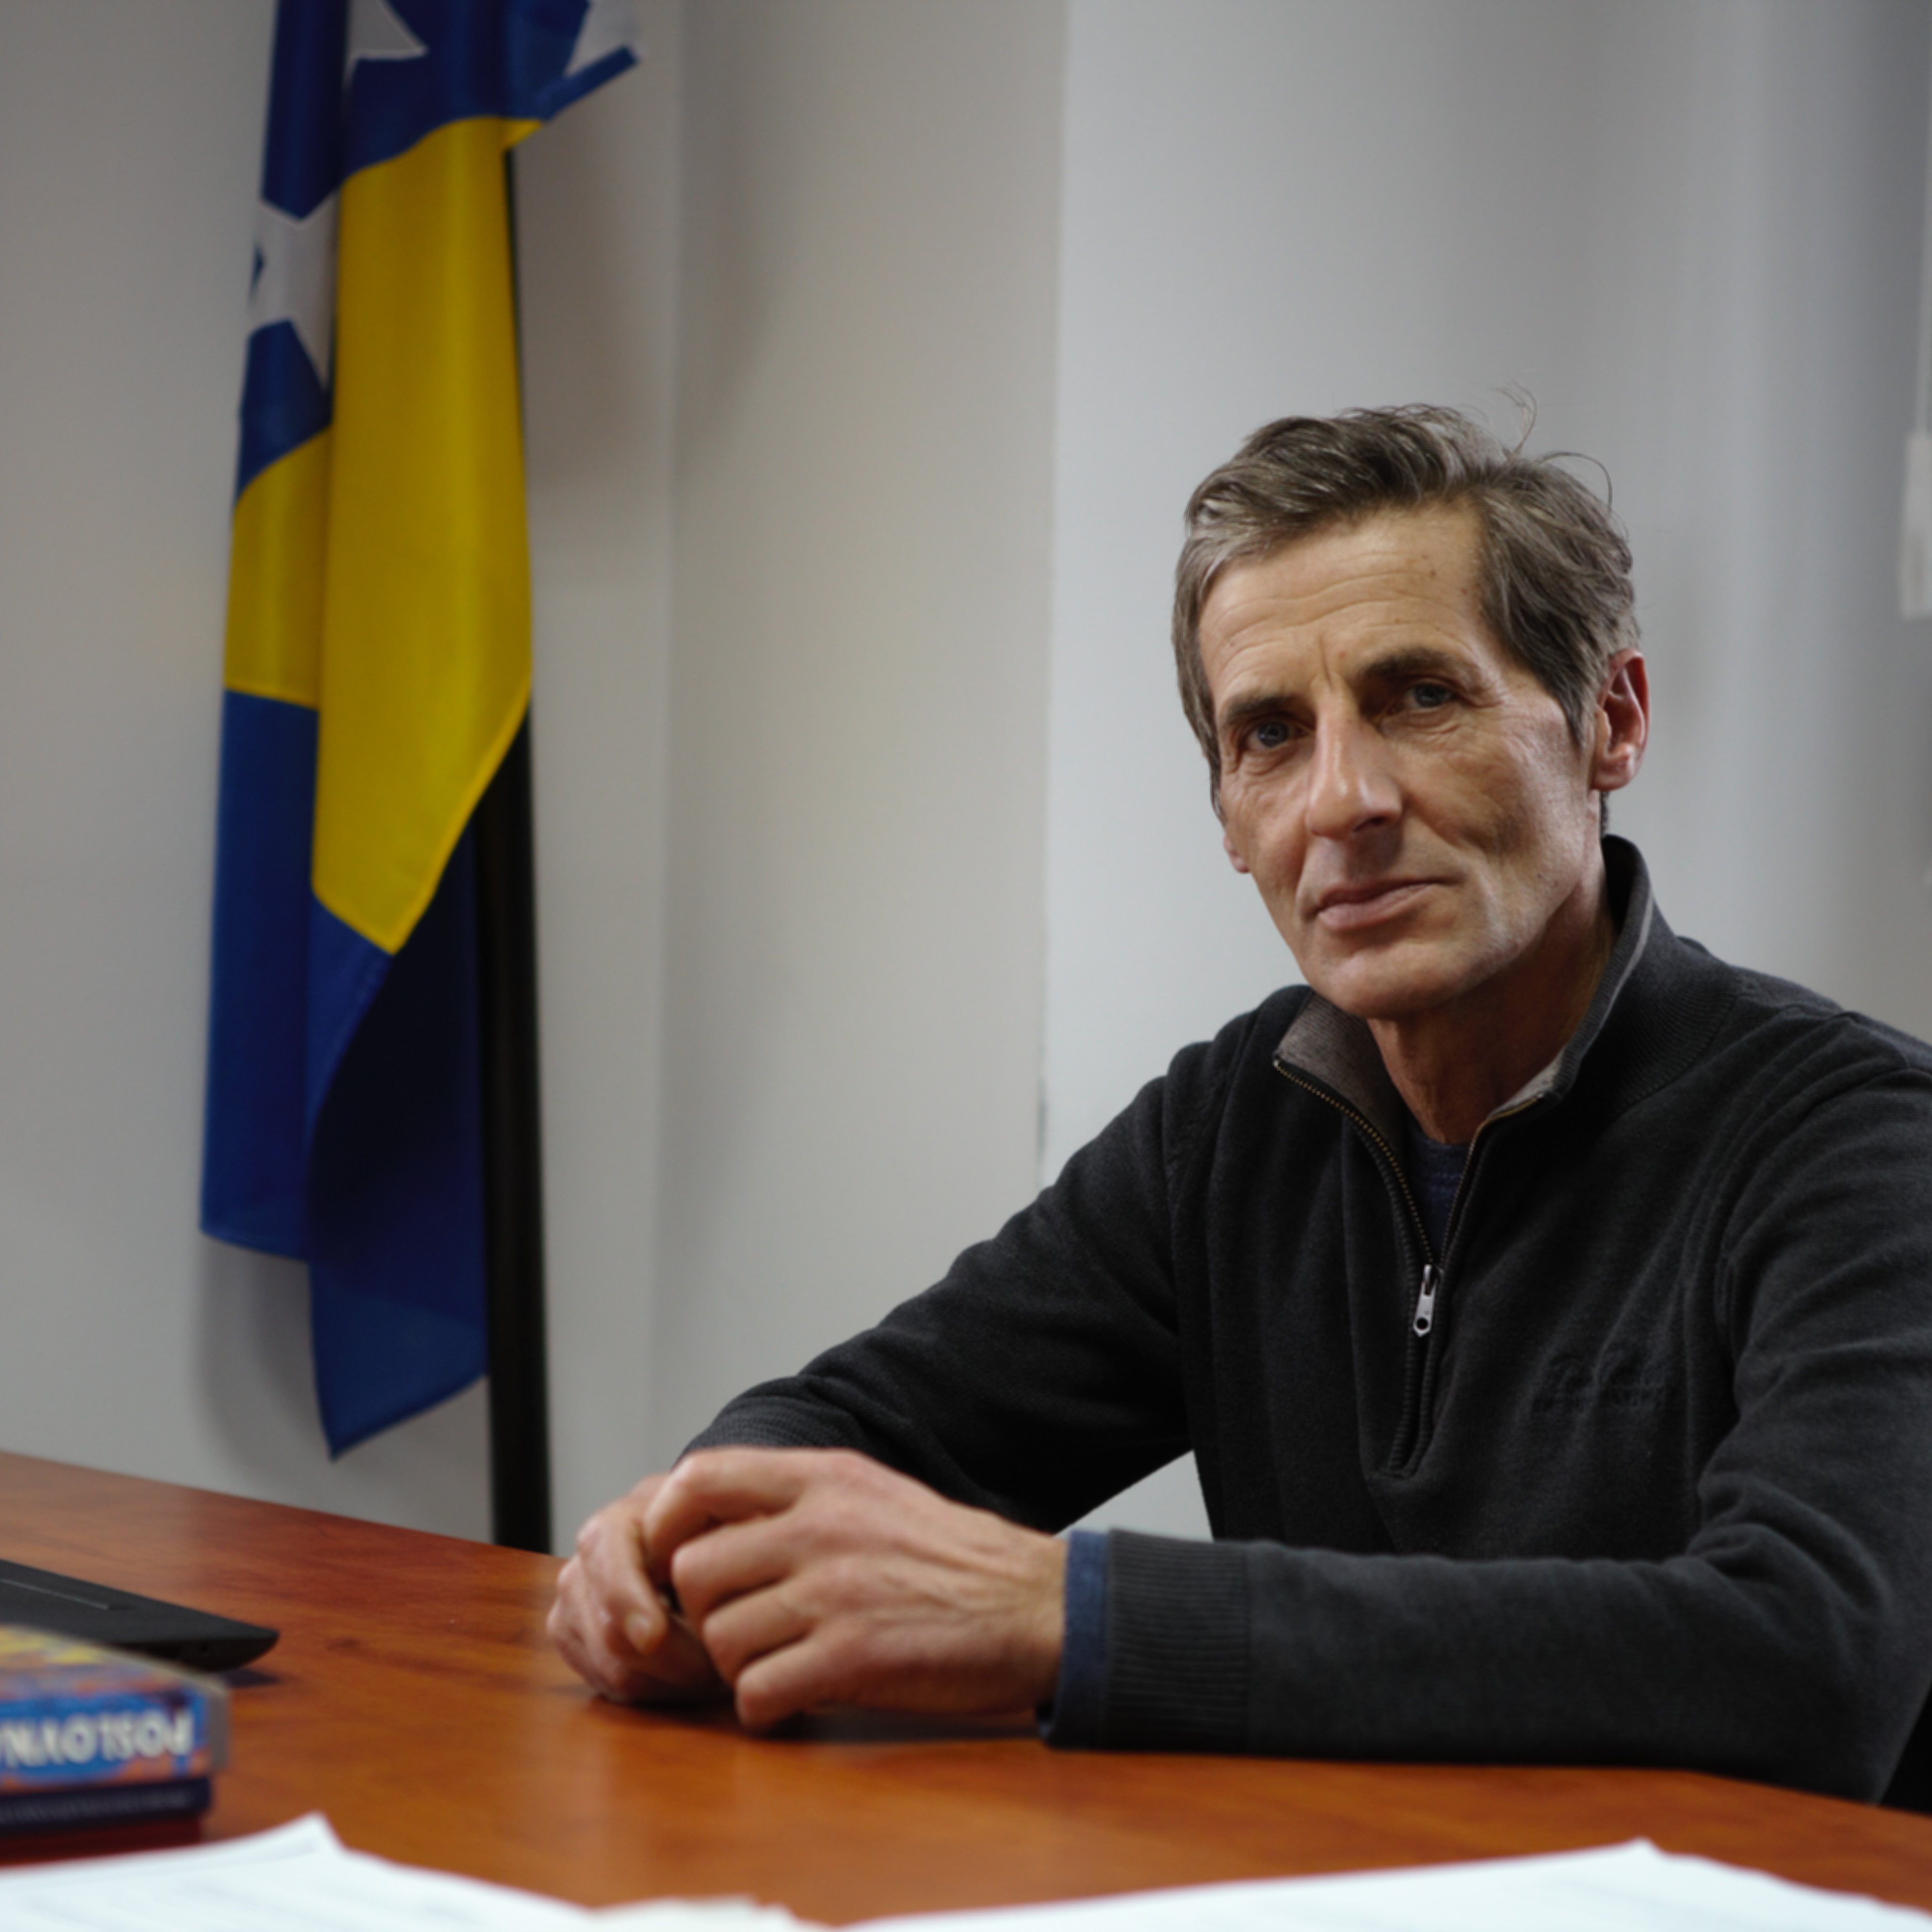 Prof. dr Nezir Krčalo : Dekan